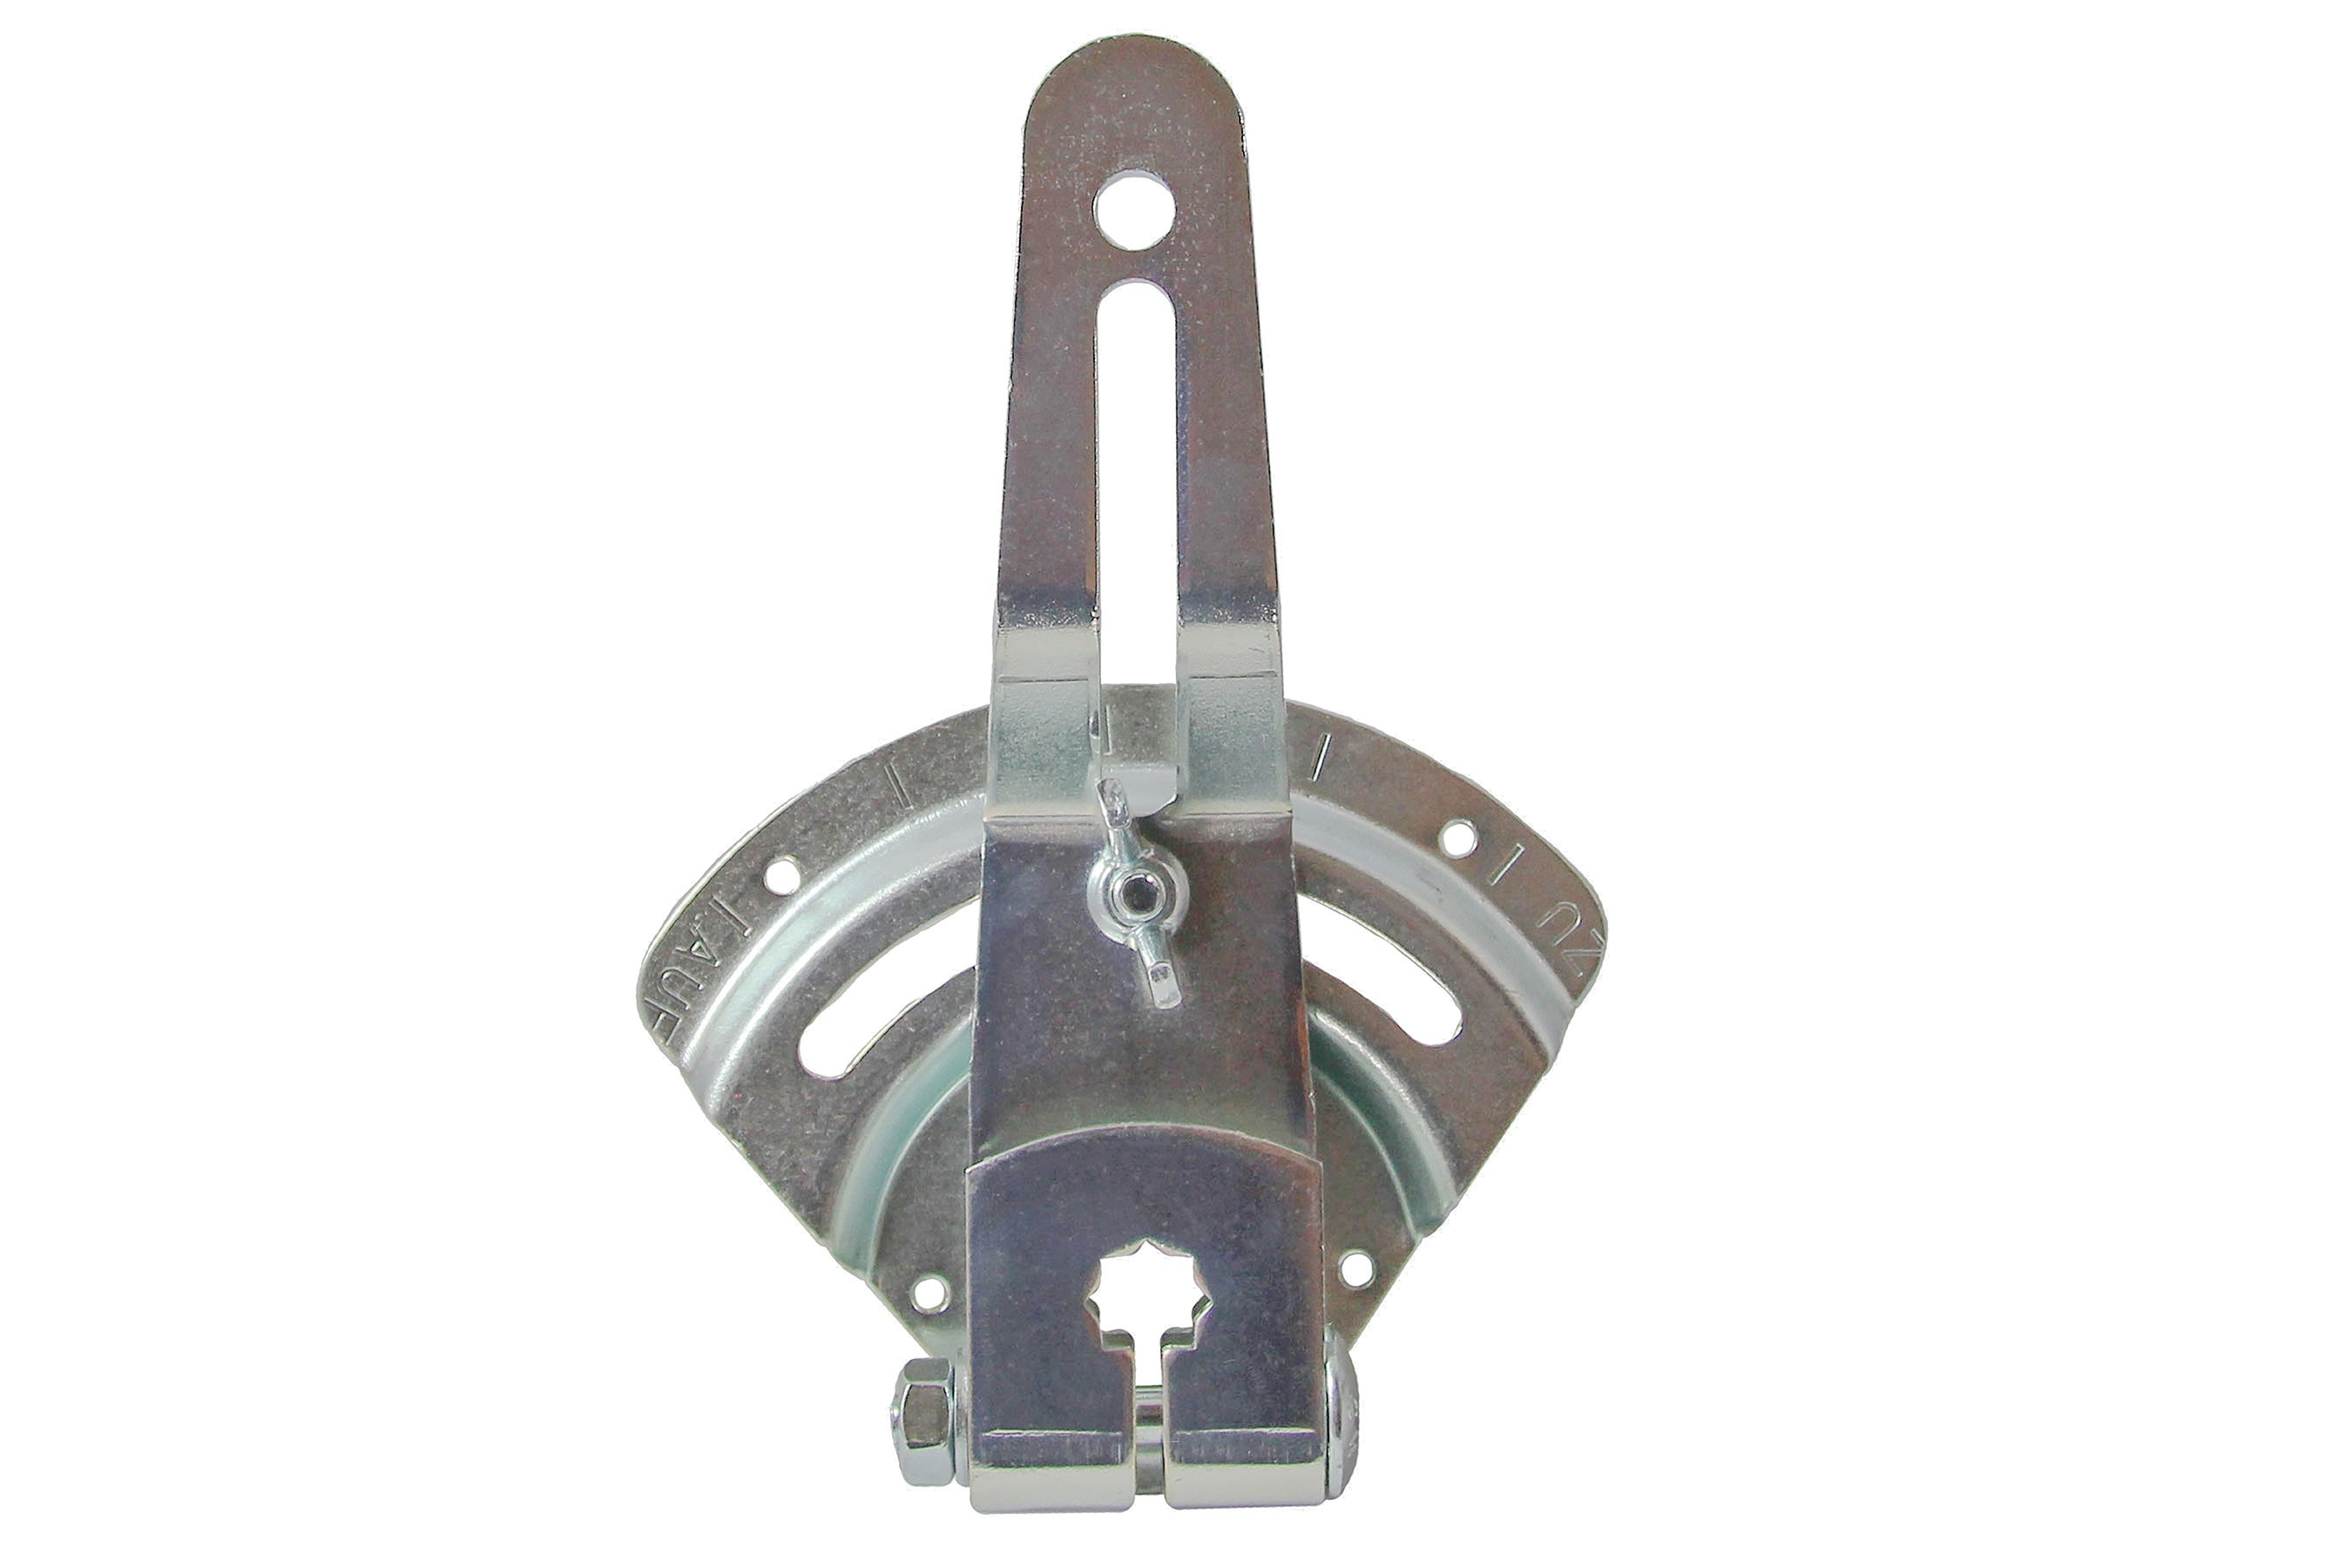 CLAPITUR V - 8 x 8 mm